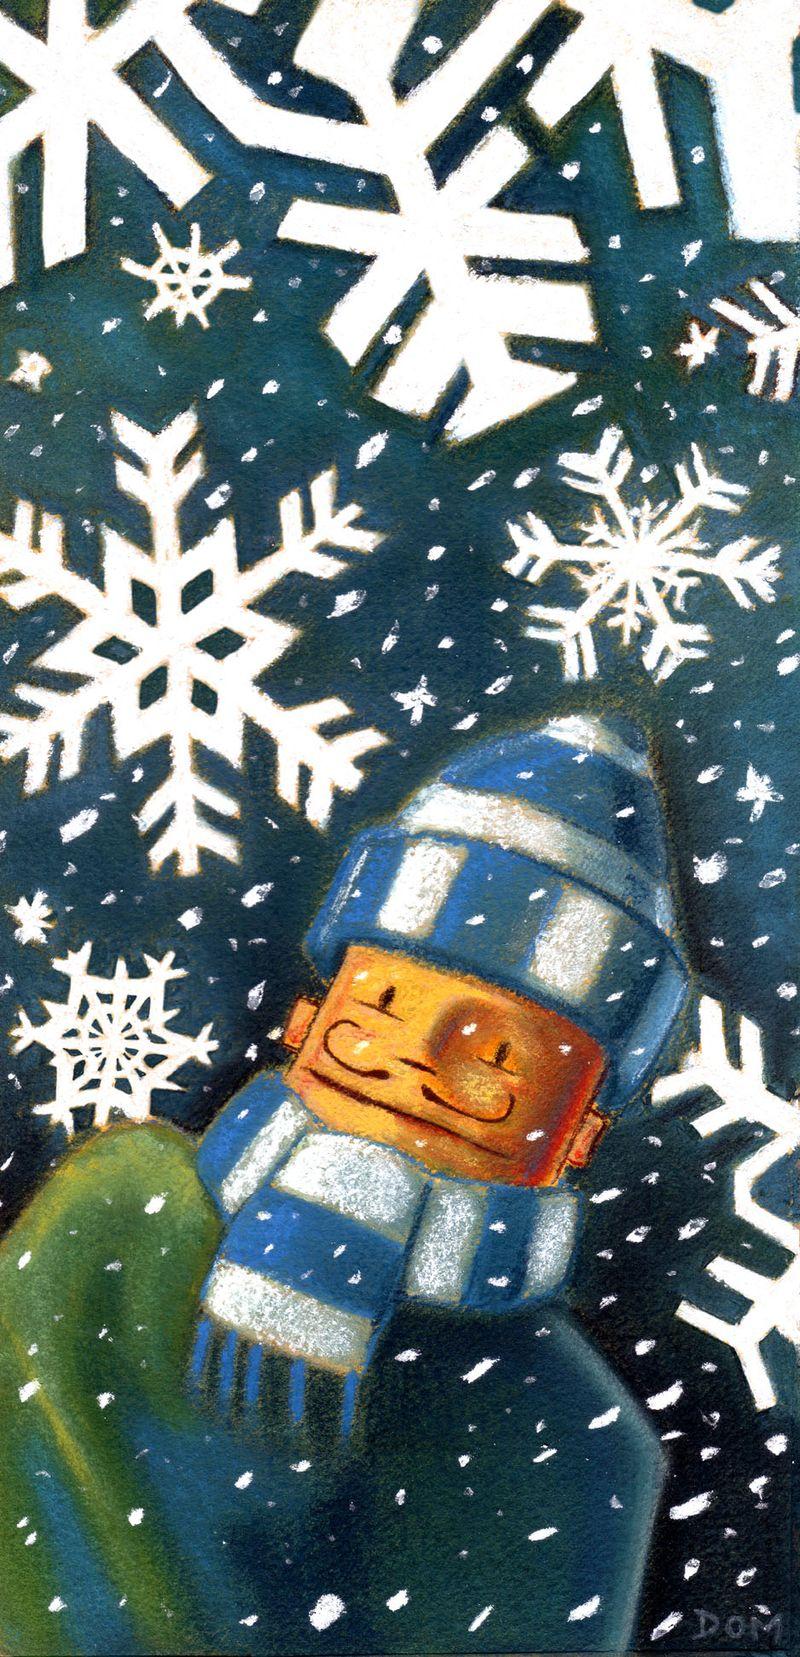 Donough O'Malley. snowflakes